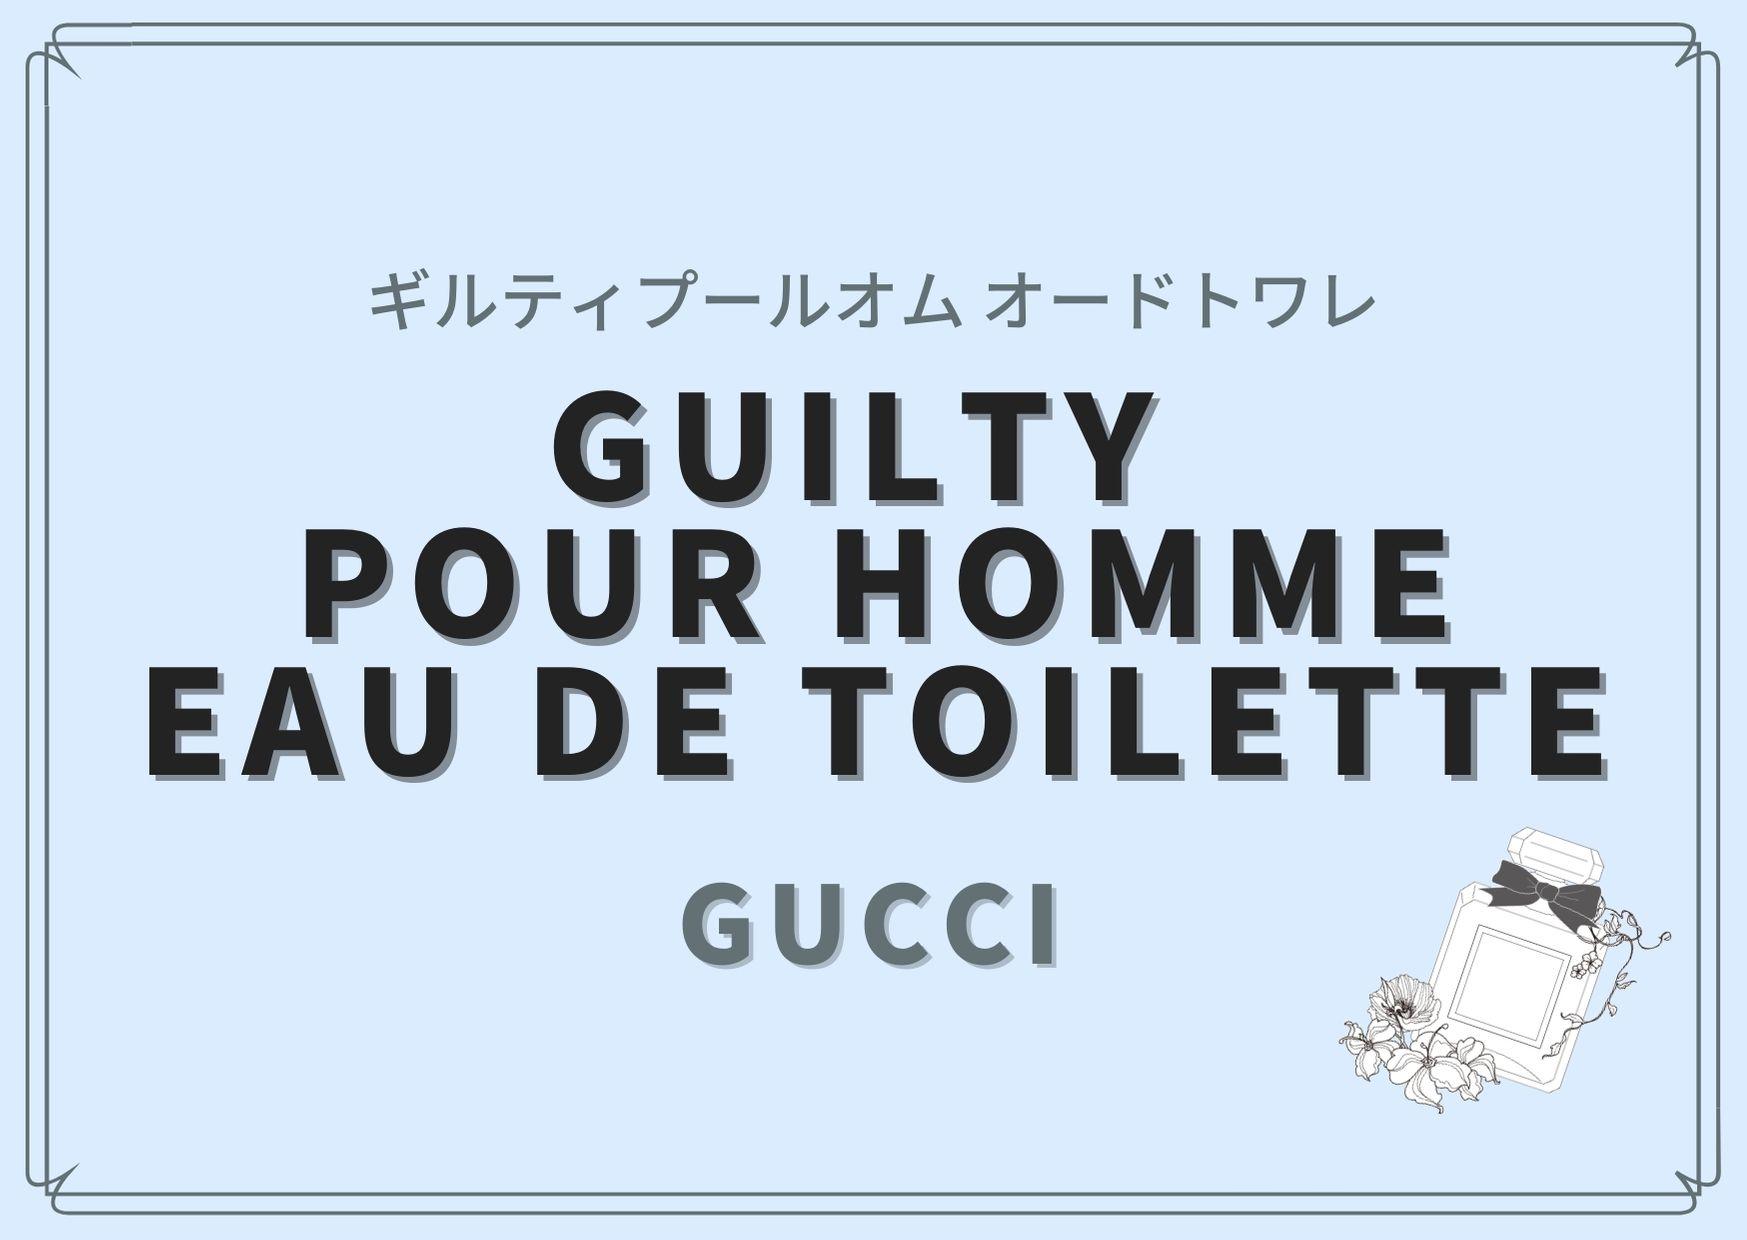 Guilty Pour Homme Eau de toilette(ギルティプールオム オードトワレ)/GUCCI(グッチ)